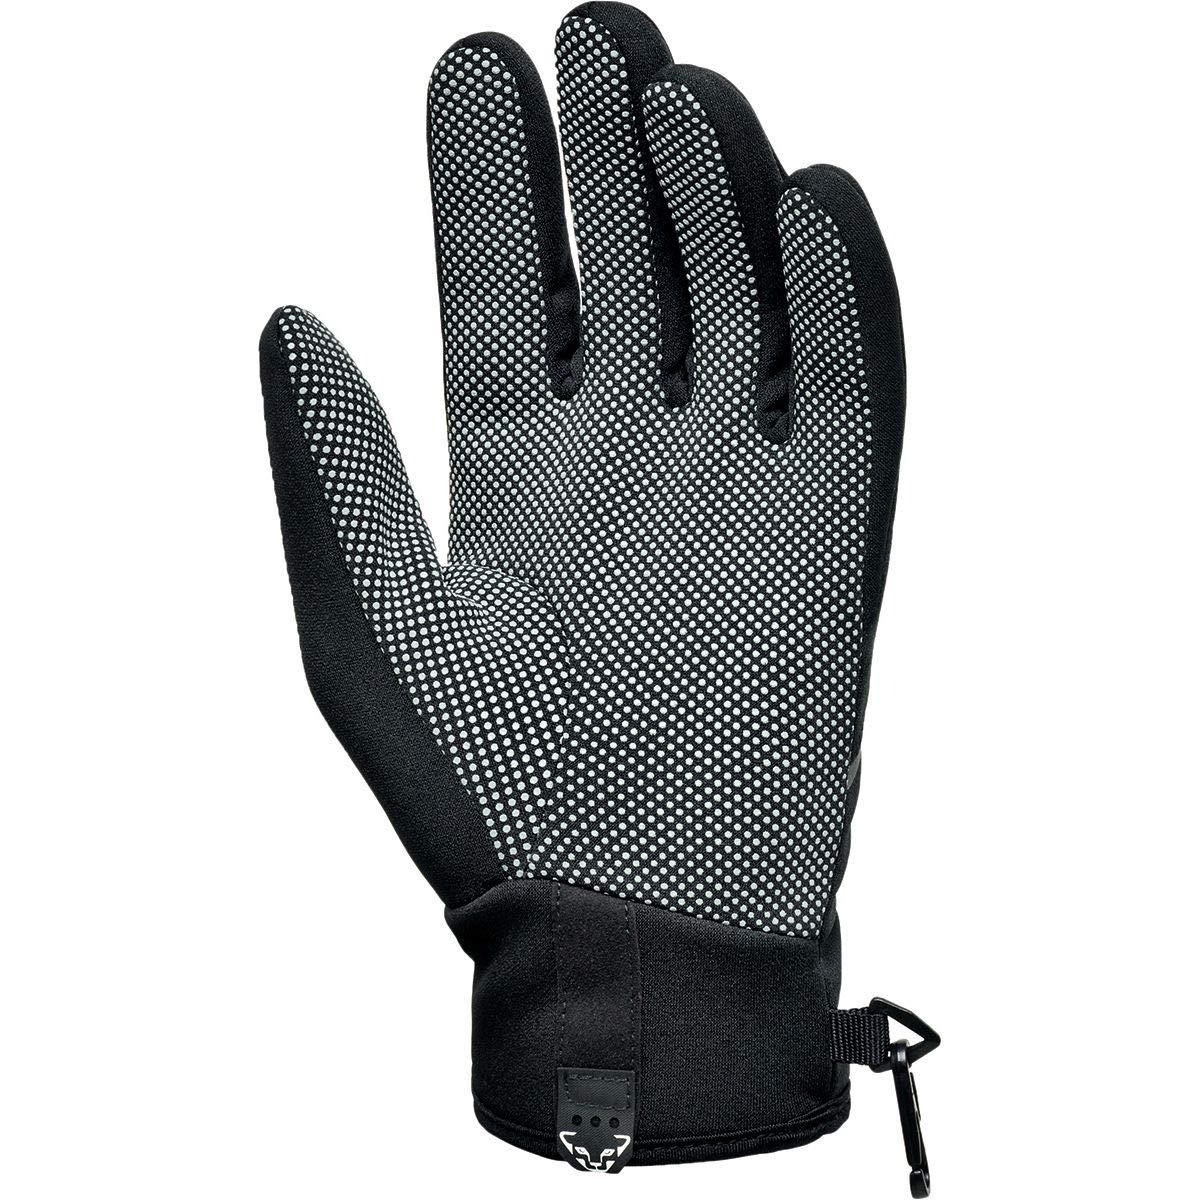 Dynafit Thermal Gloves Black M by Dynafit (Image #2)